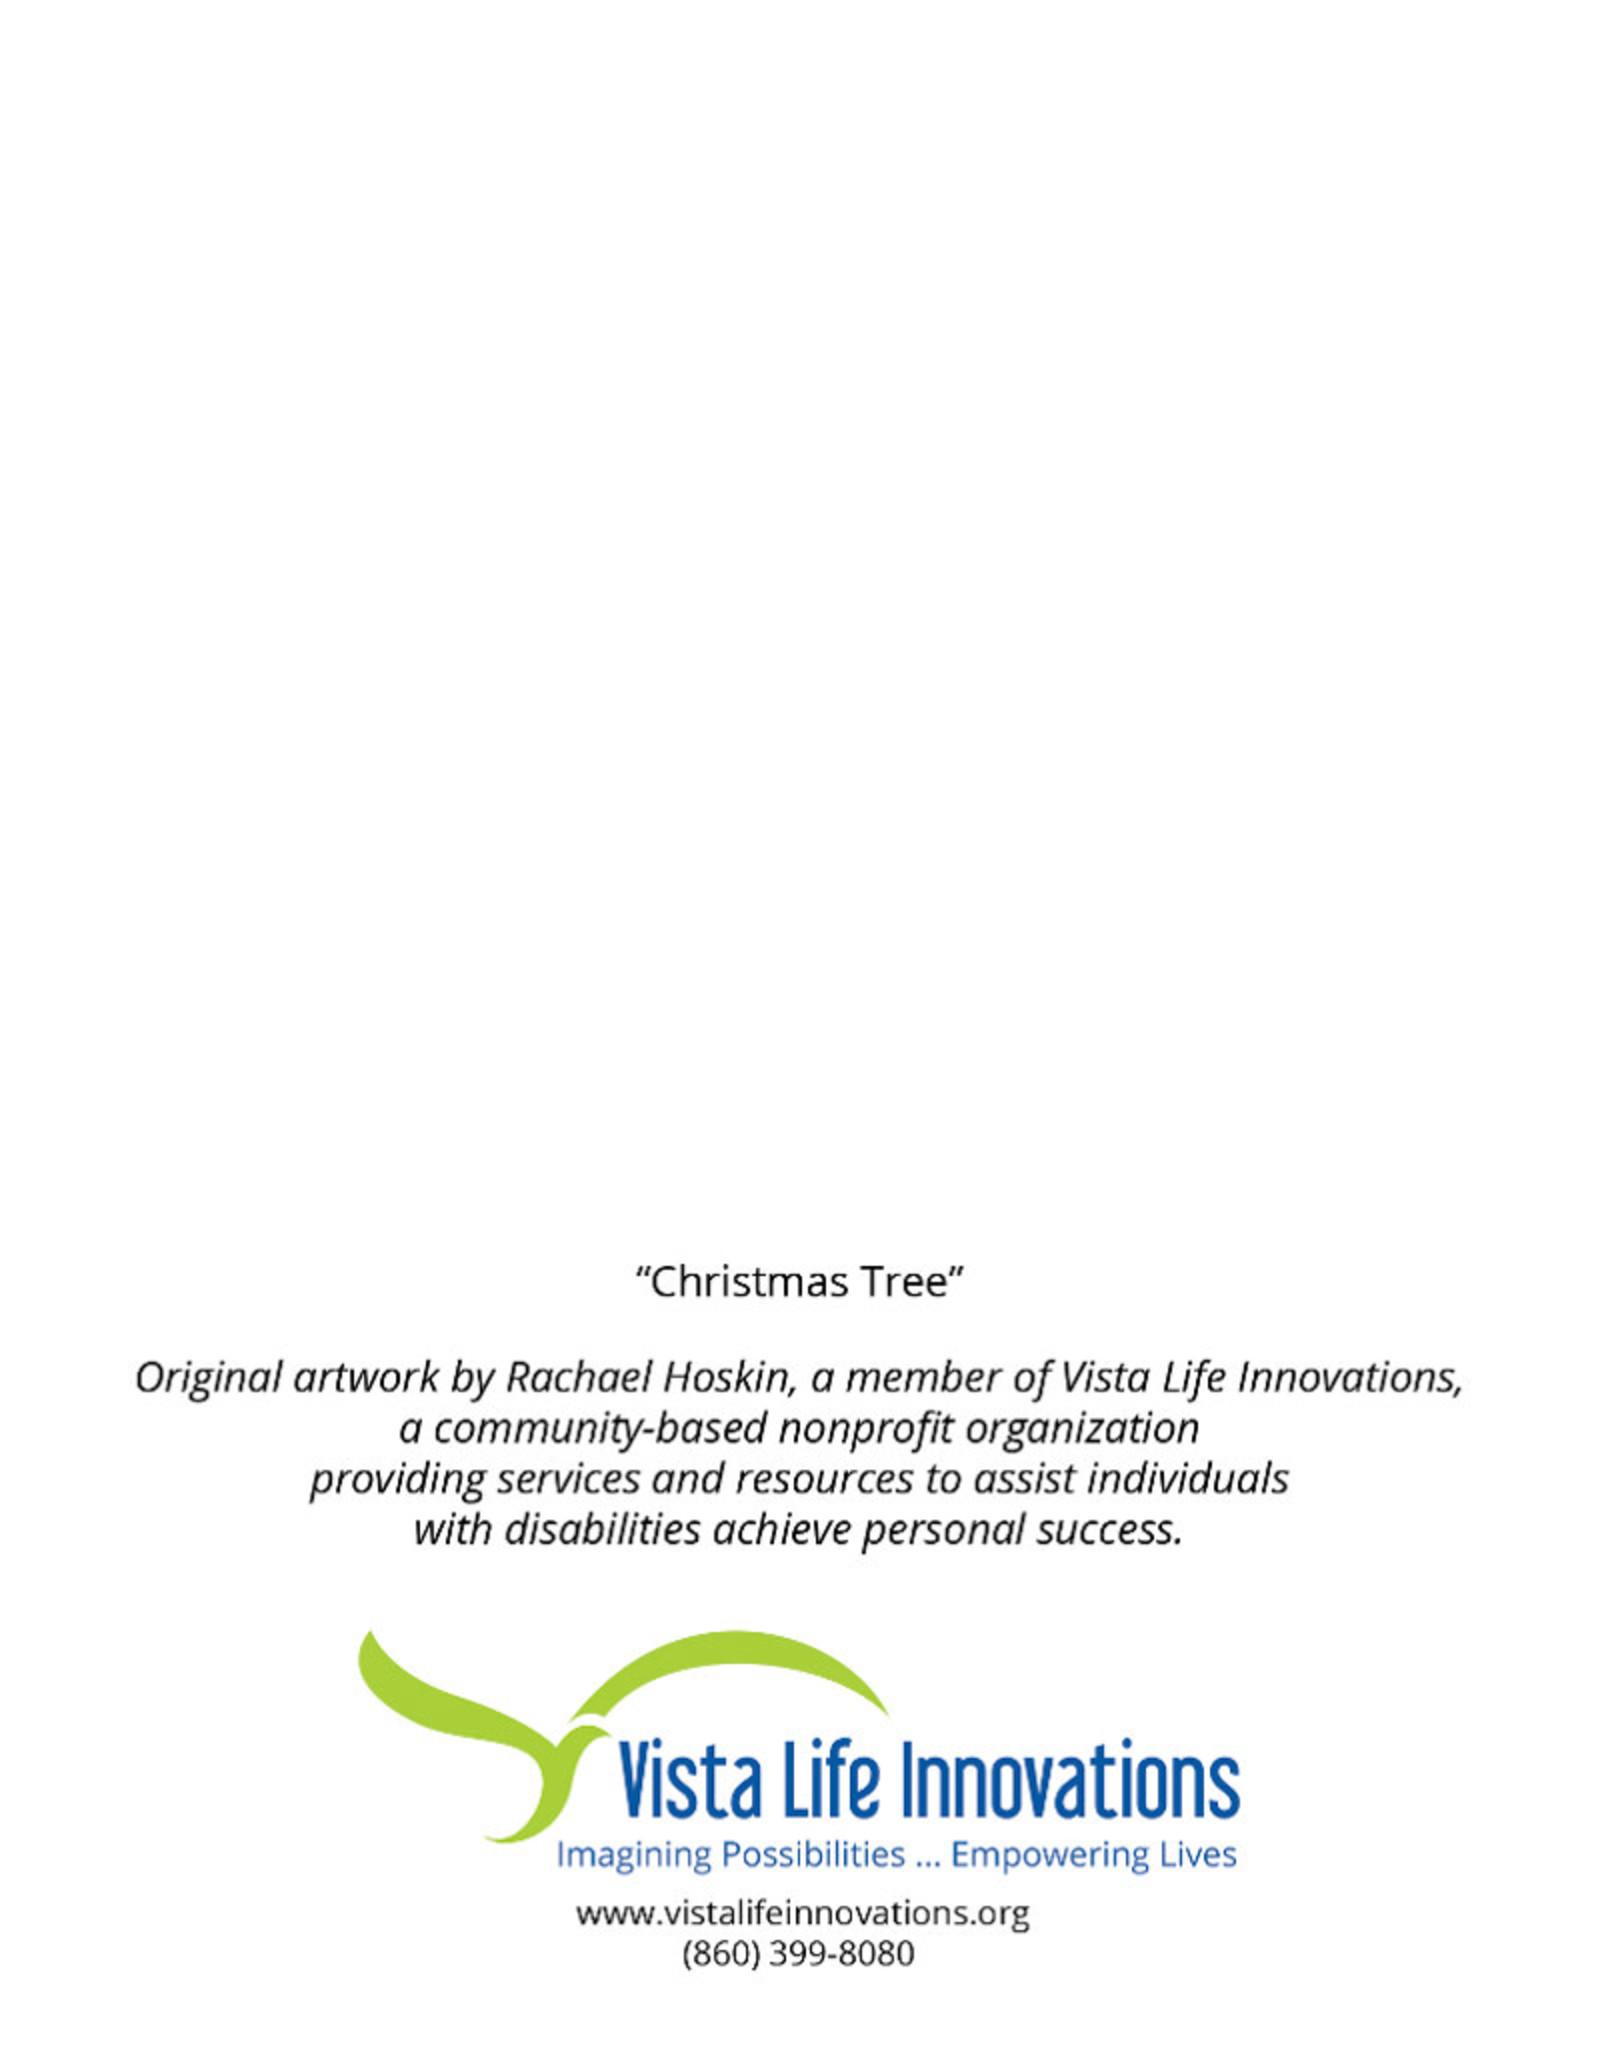 Create Greeting Card-Merry Christmas-Christmas Tree